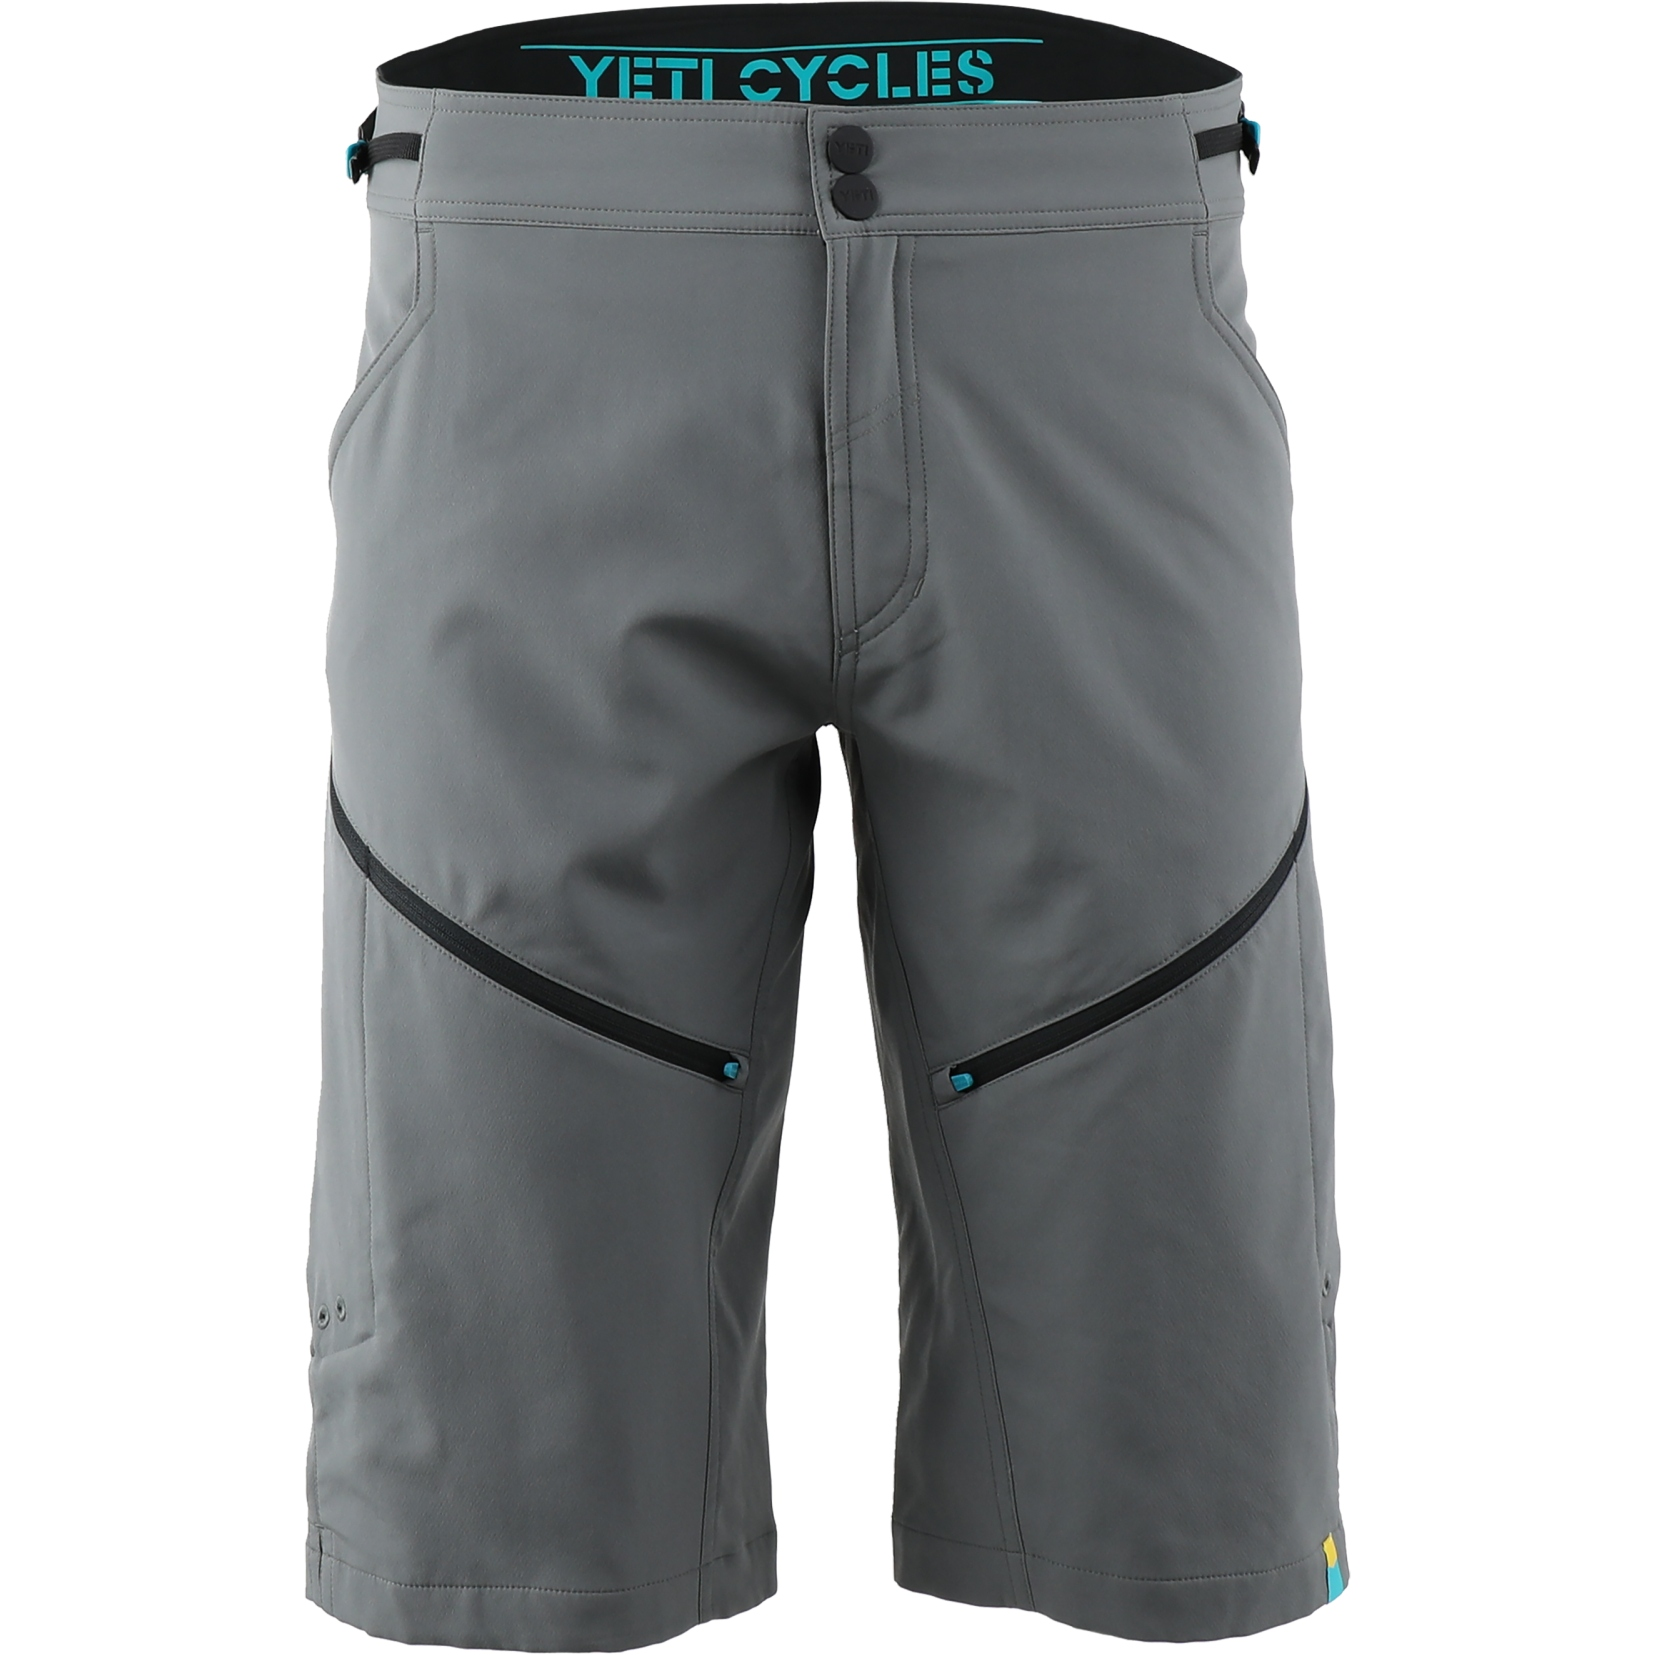 Yeti Cycles Freeland 2.0 Shorts - Gunmetal